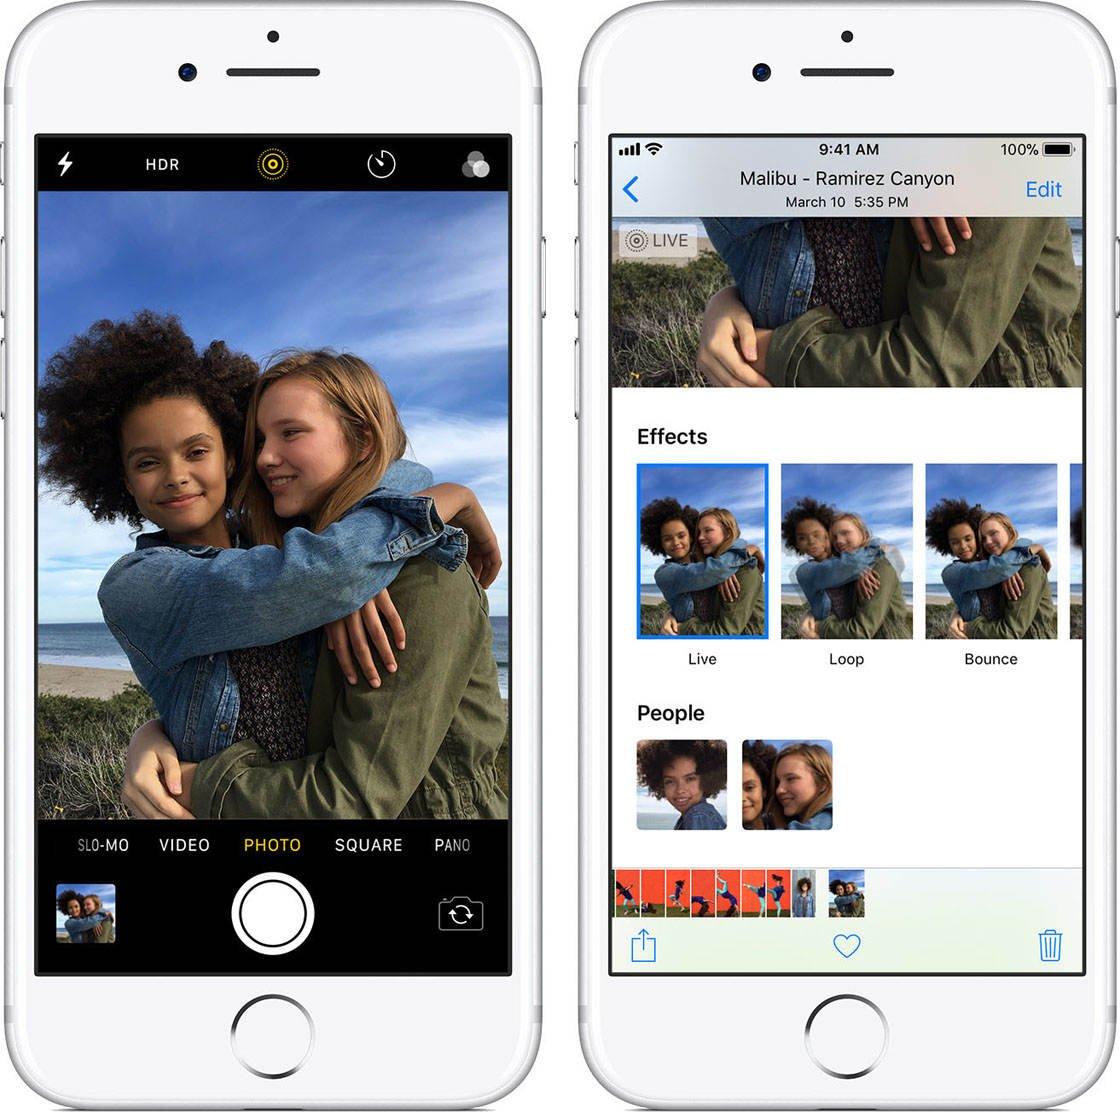 Native iPhone Camera App Live Photos